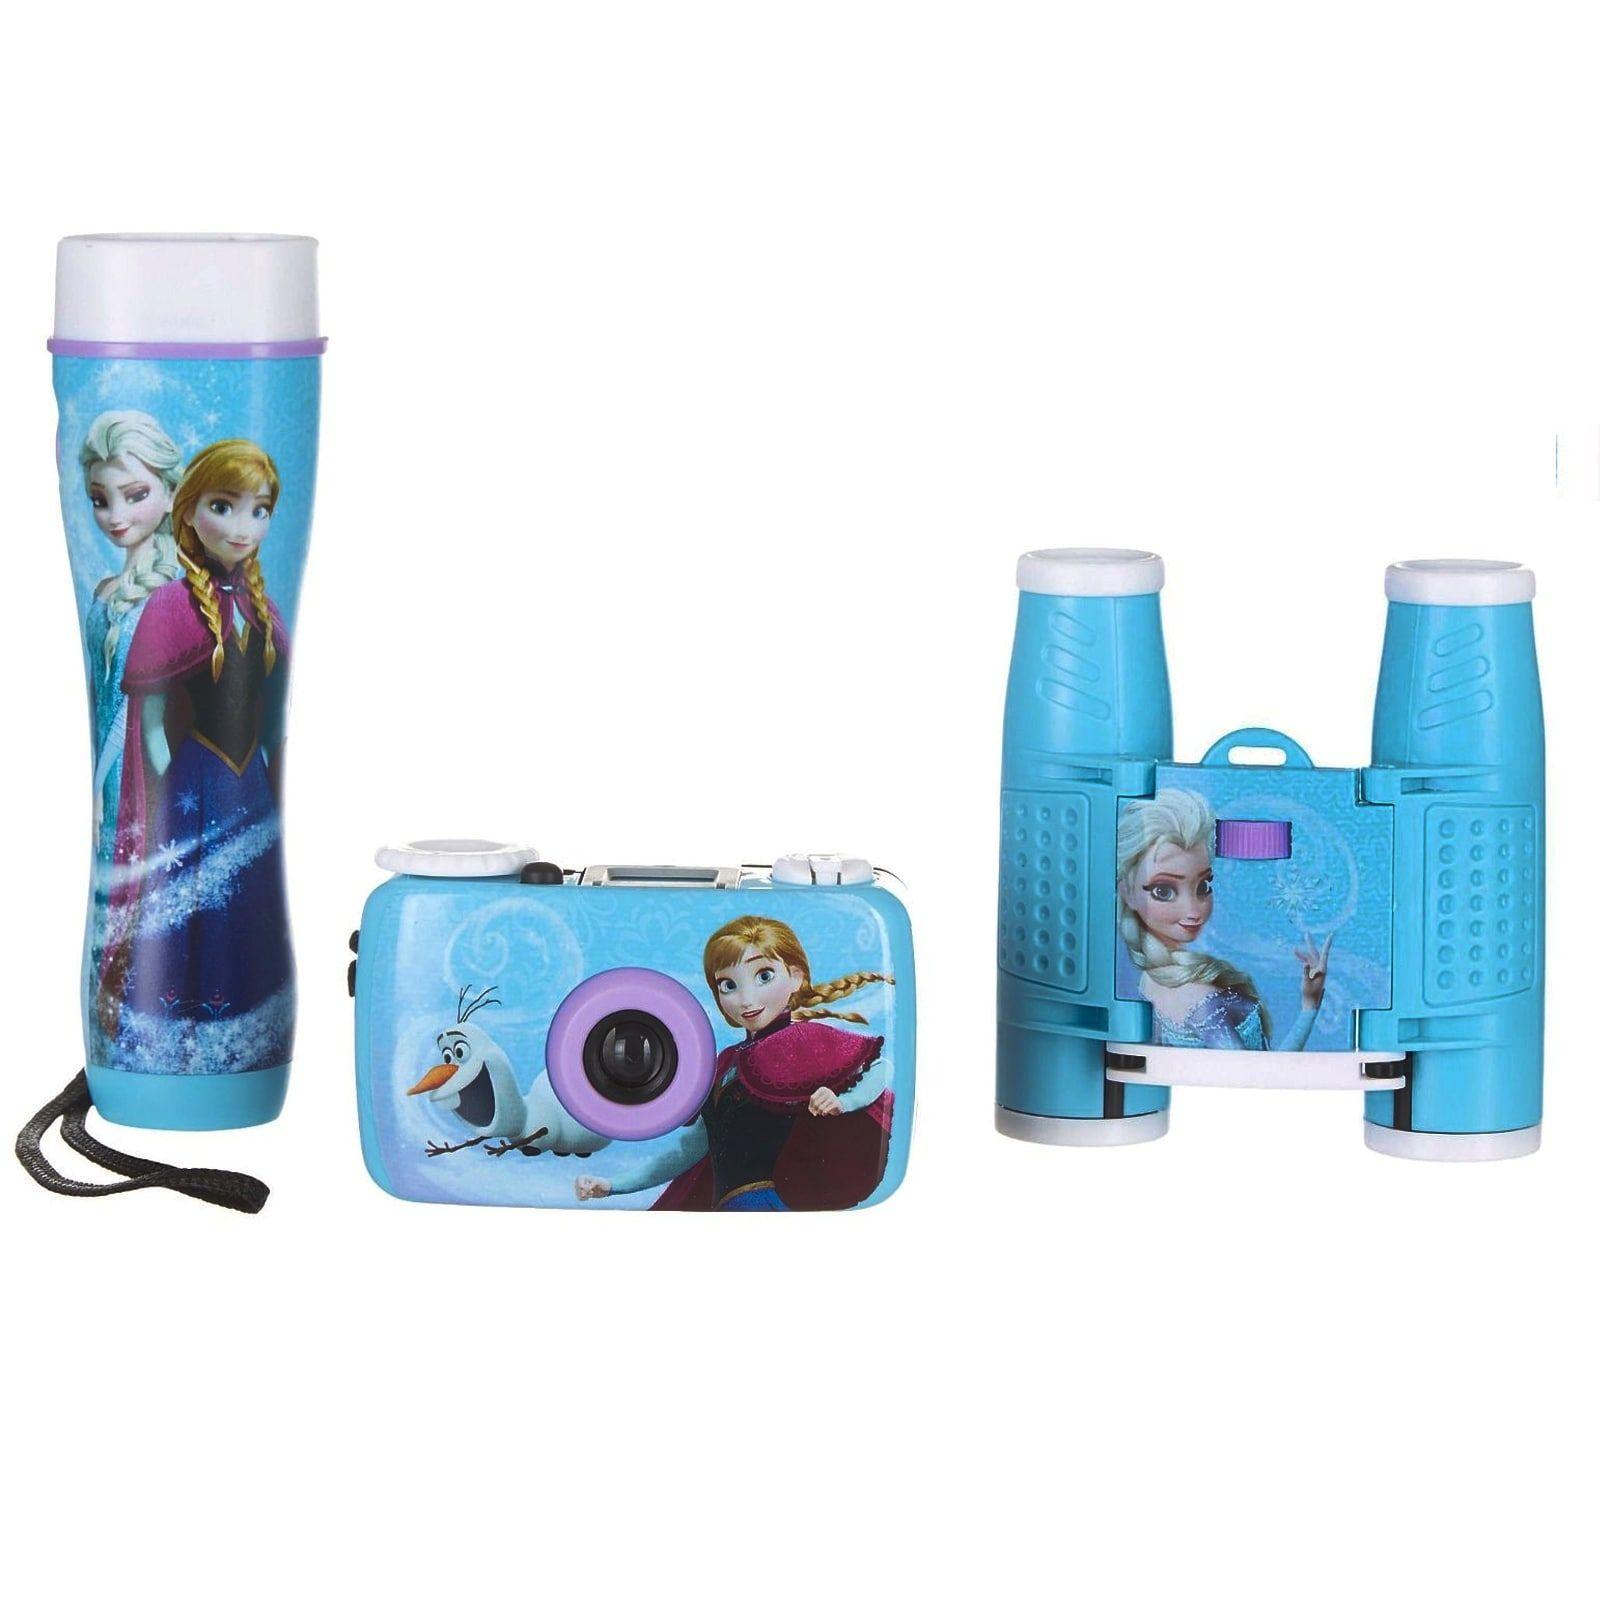 Disney Frozen Adventure Kit w/35mm Camera, Binoculars and Flashlight ...